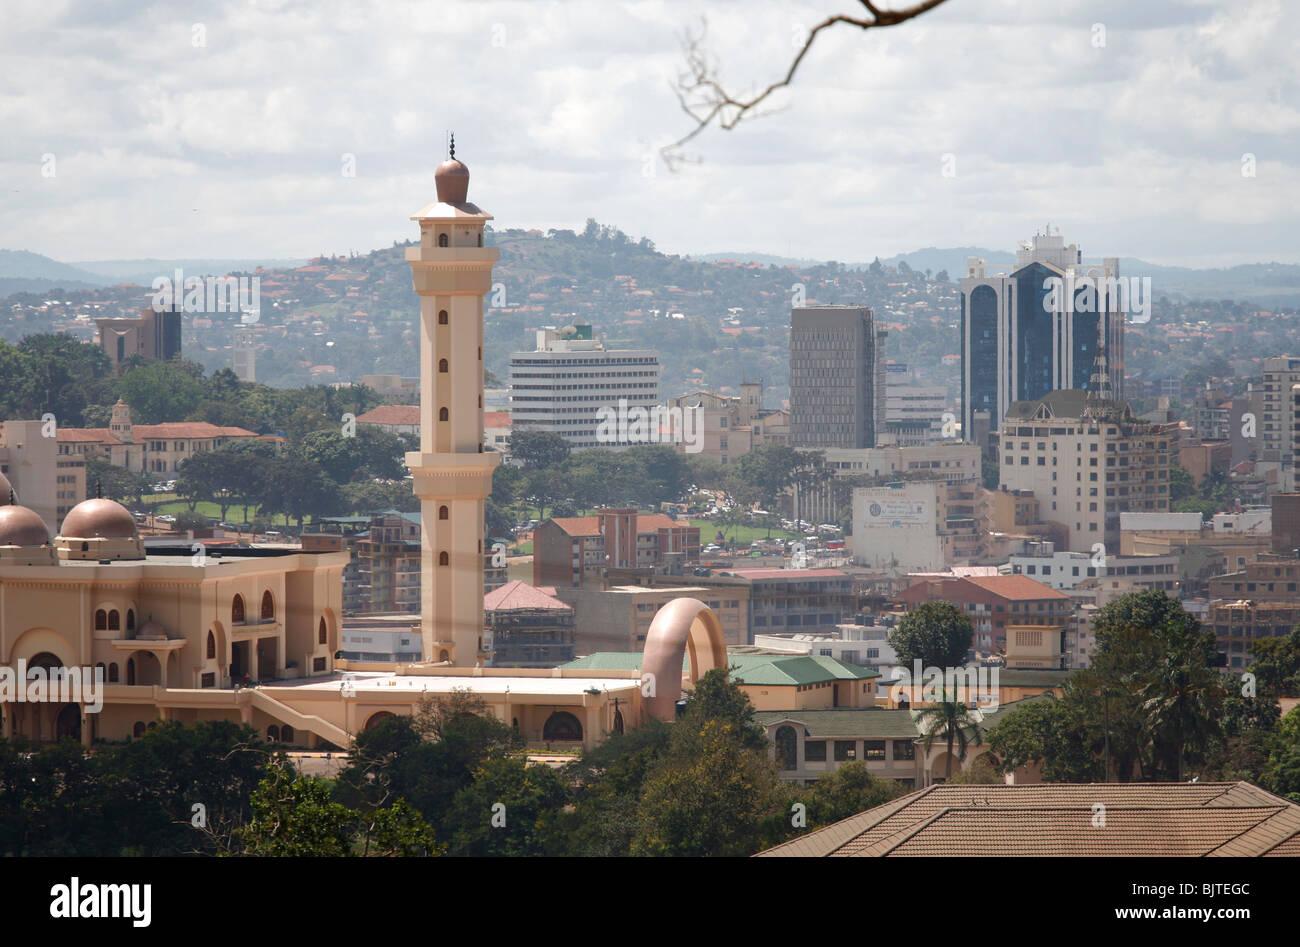 Colonel Gaddafi mosque kampala - Stock Image